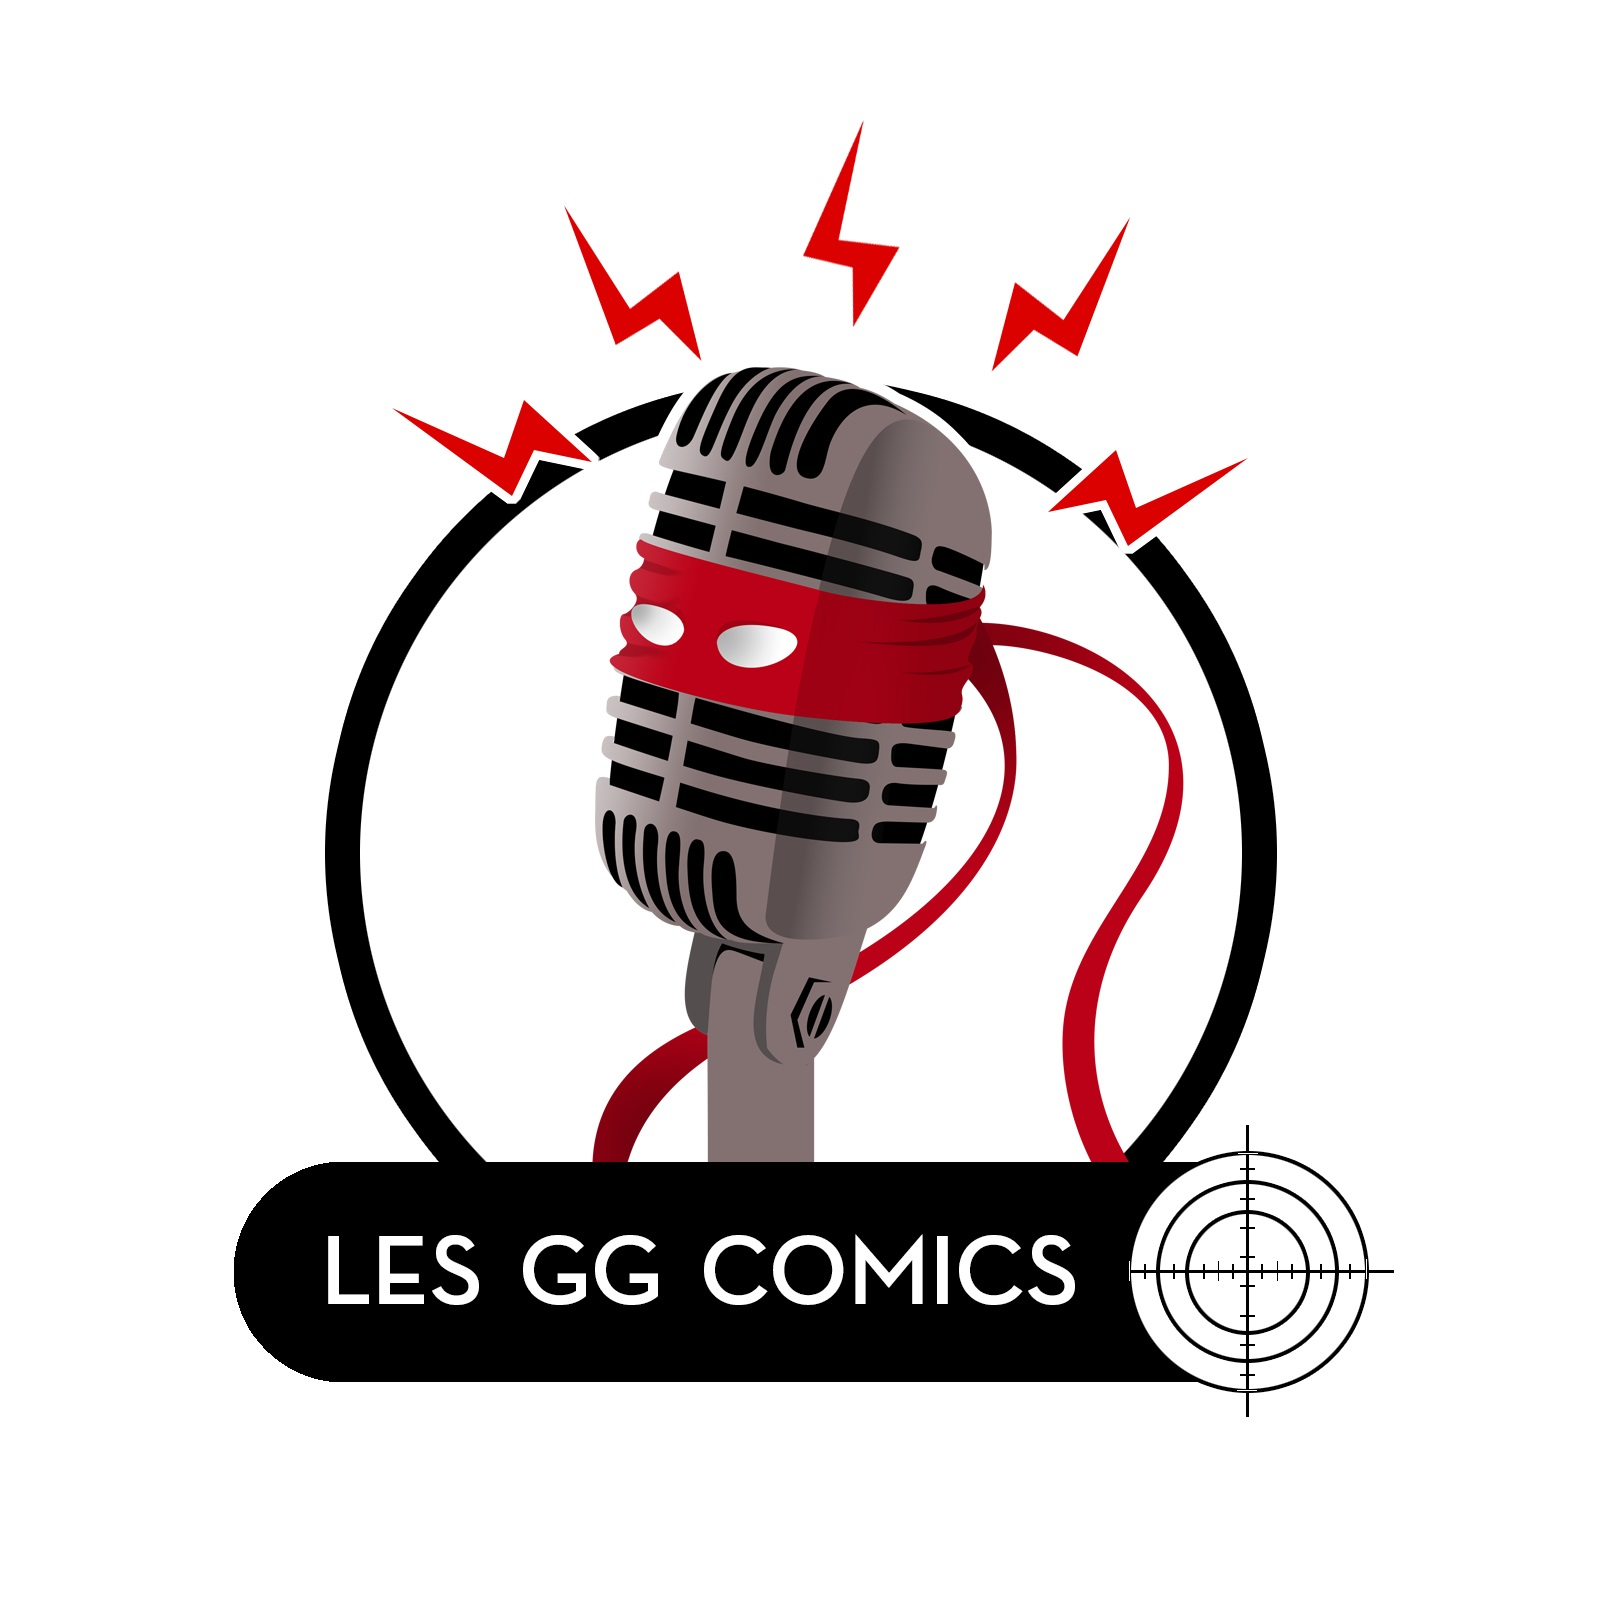 Les GG Comics #57 : Les comics peuvent-ils sauver la jeunesse ?